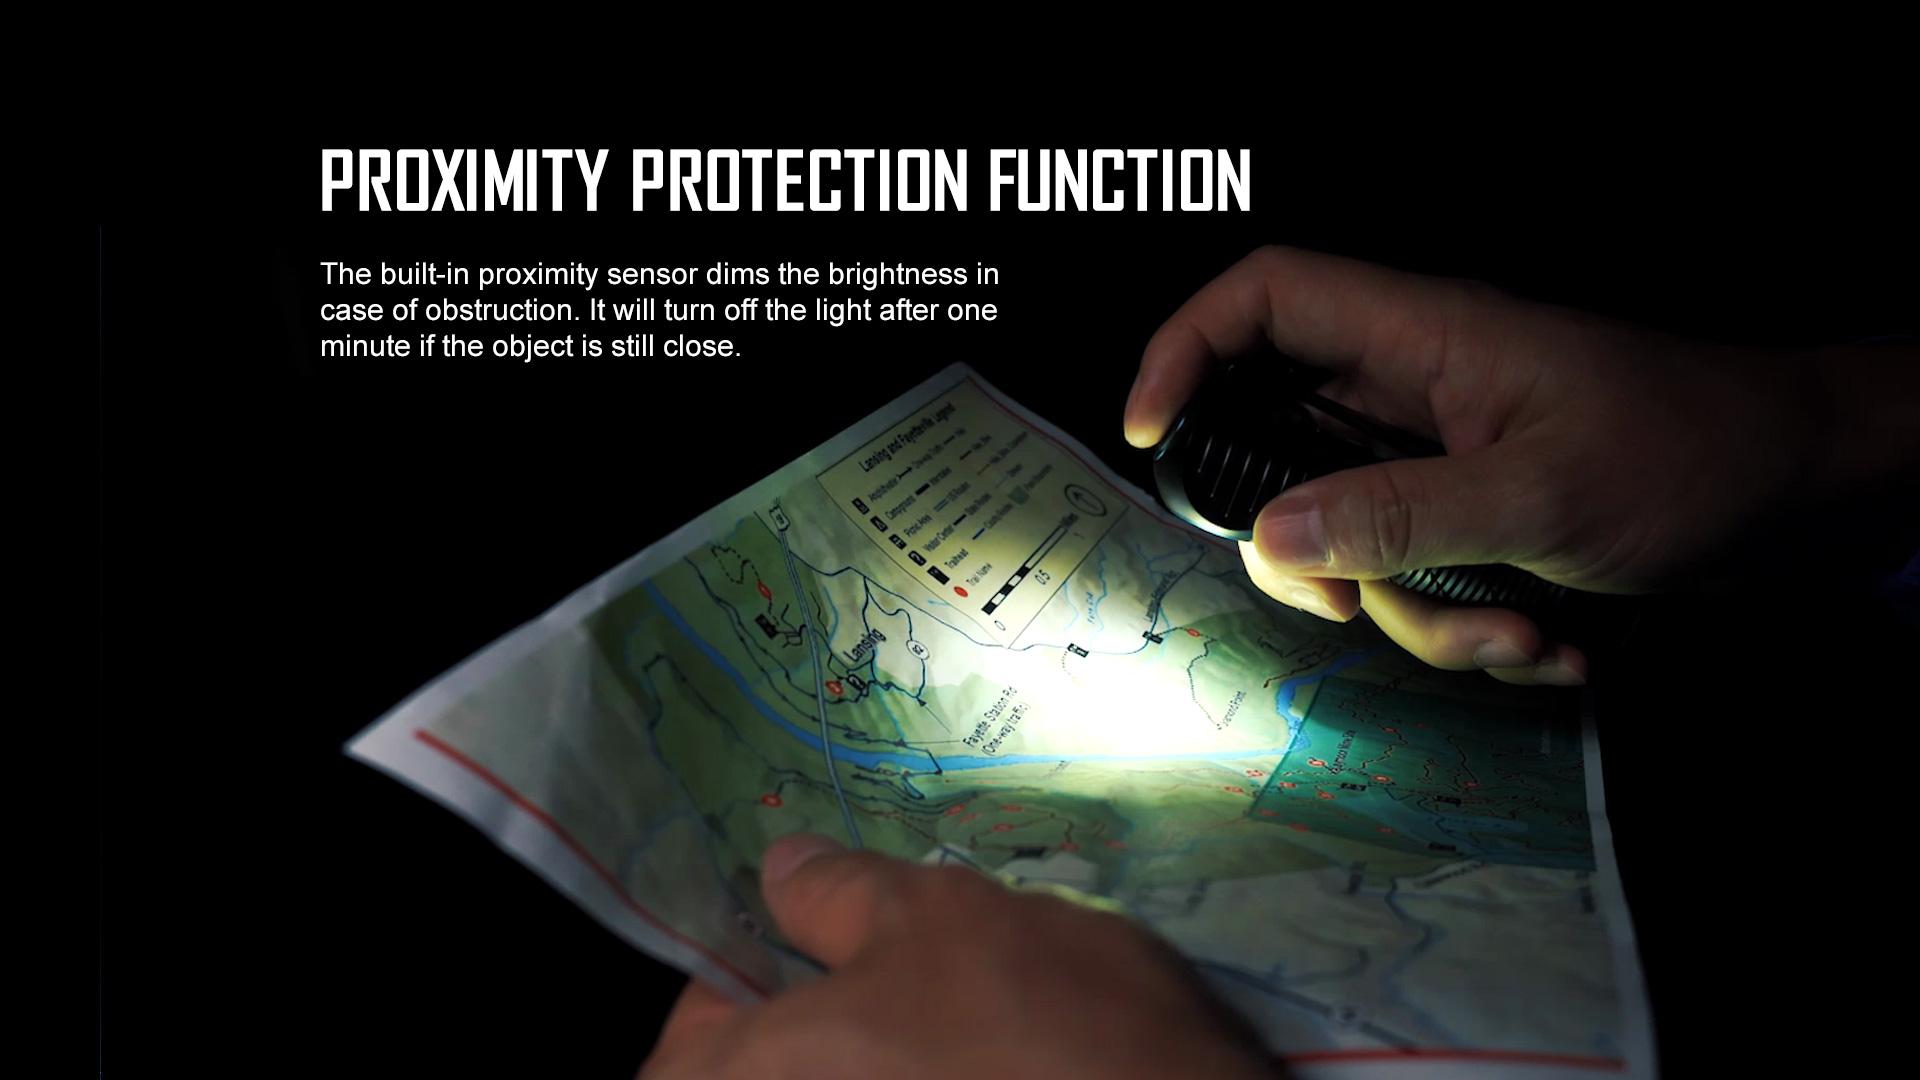 perun 2 Proximity Protection